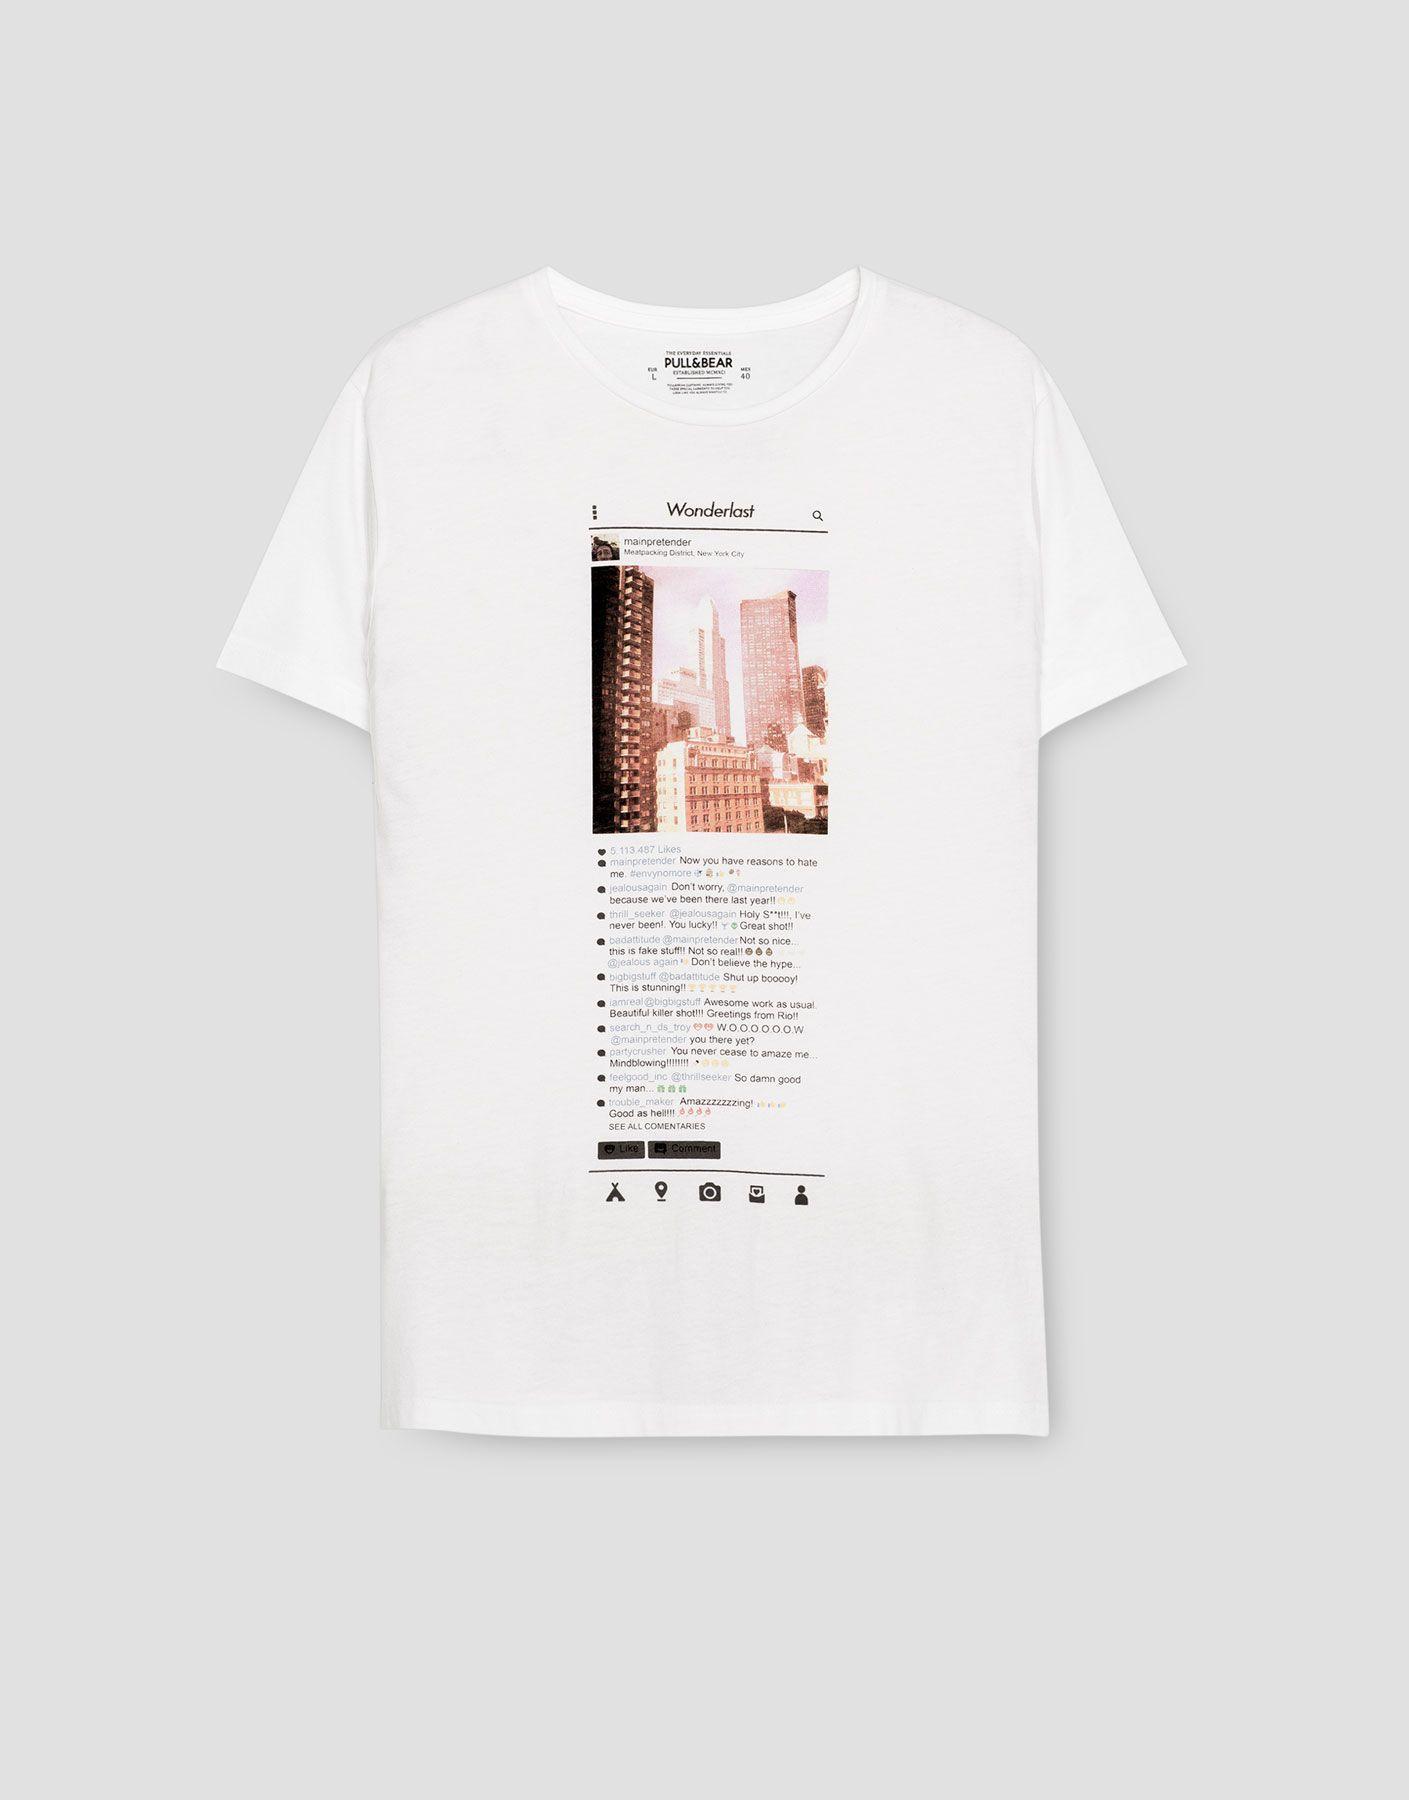 Camiseta Fotográfica Camisetas Ropa Hombre Pull Bear España Camisetas Camisetas Femeninas Camisetas Estampadas